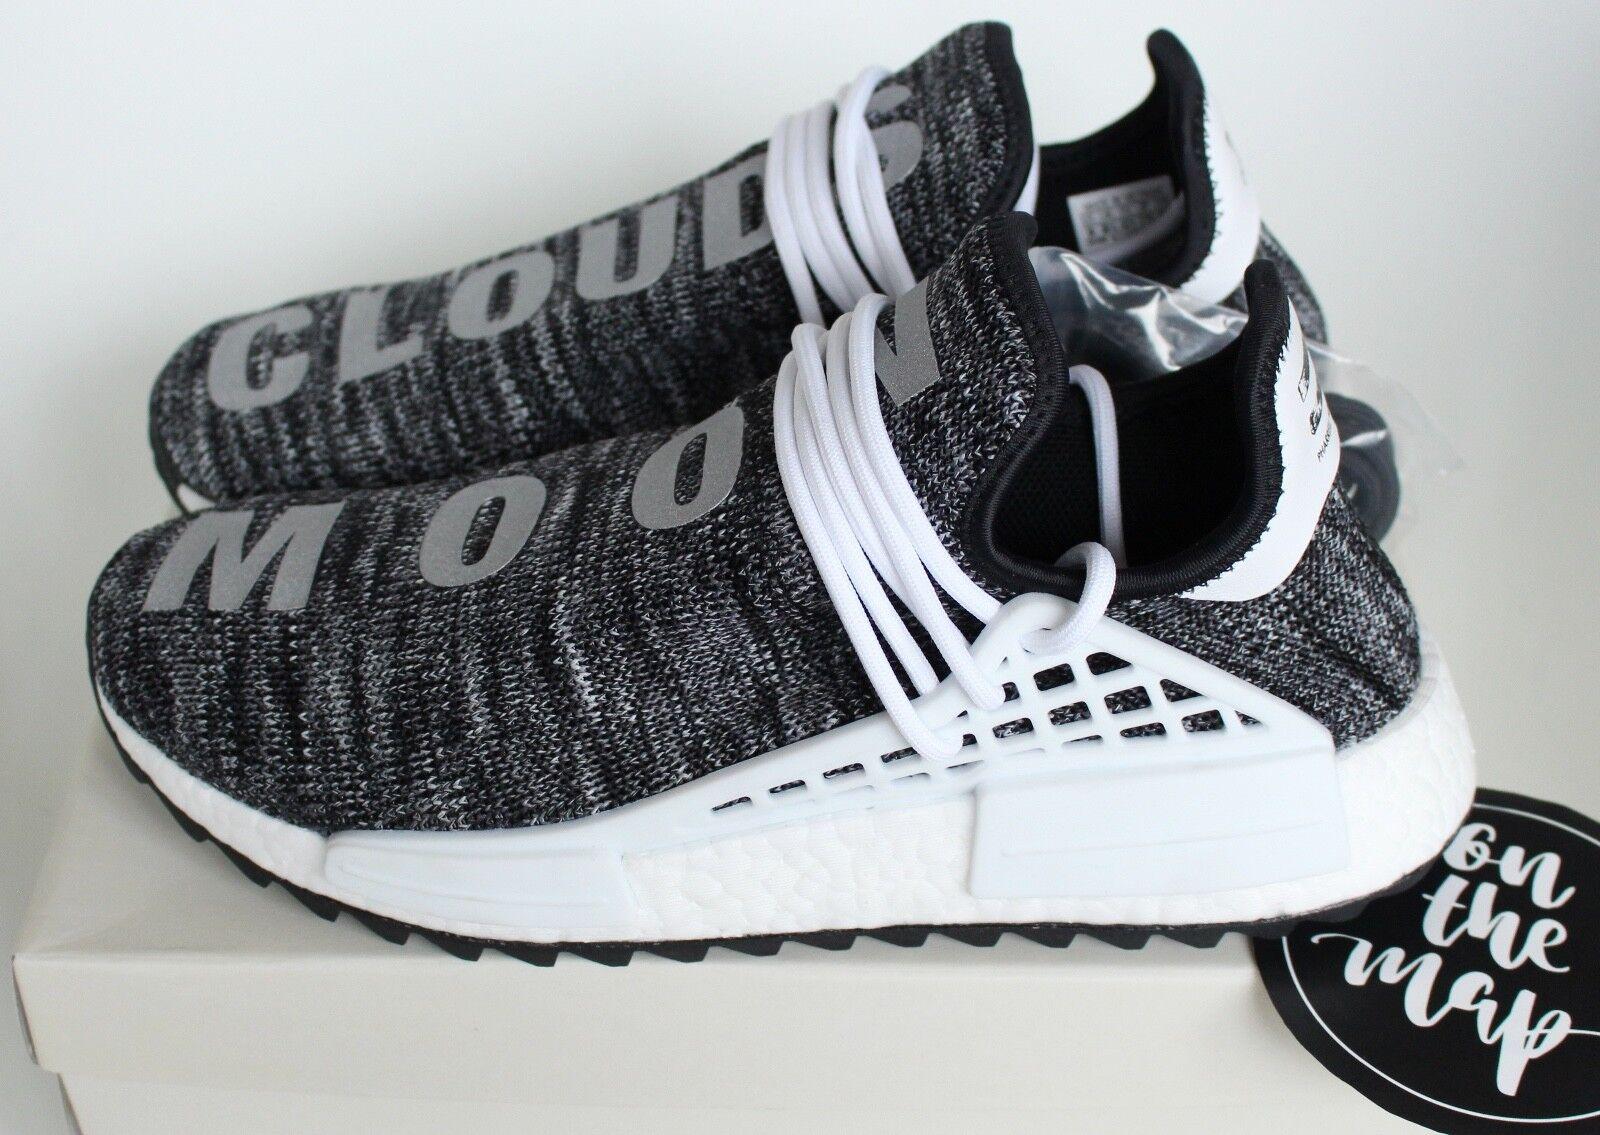 Adidas Pharrell Human Race HU NMD Trail Oreo Black White Grey 5 6 7 8 9 10 11